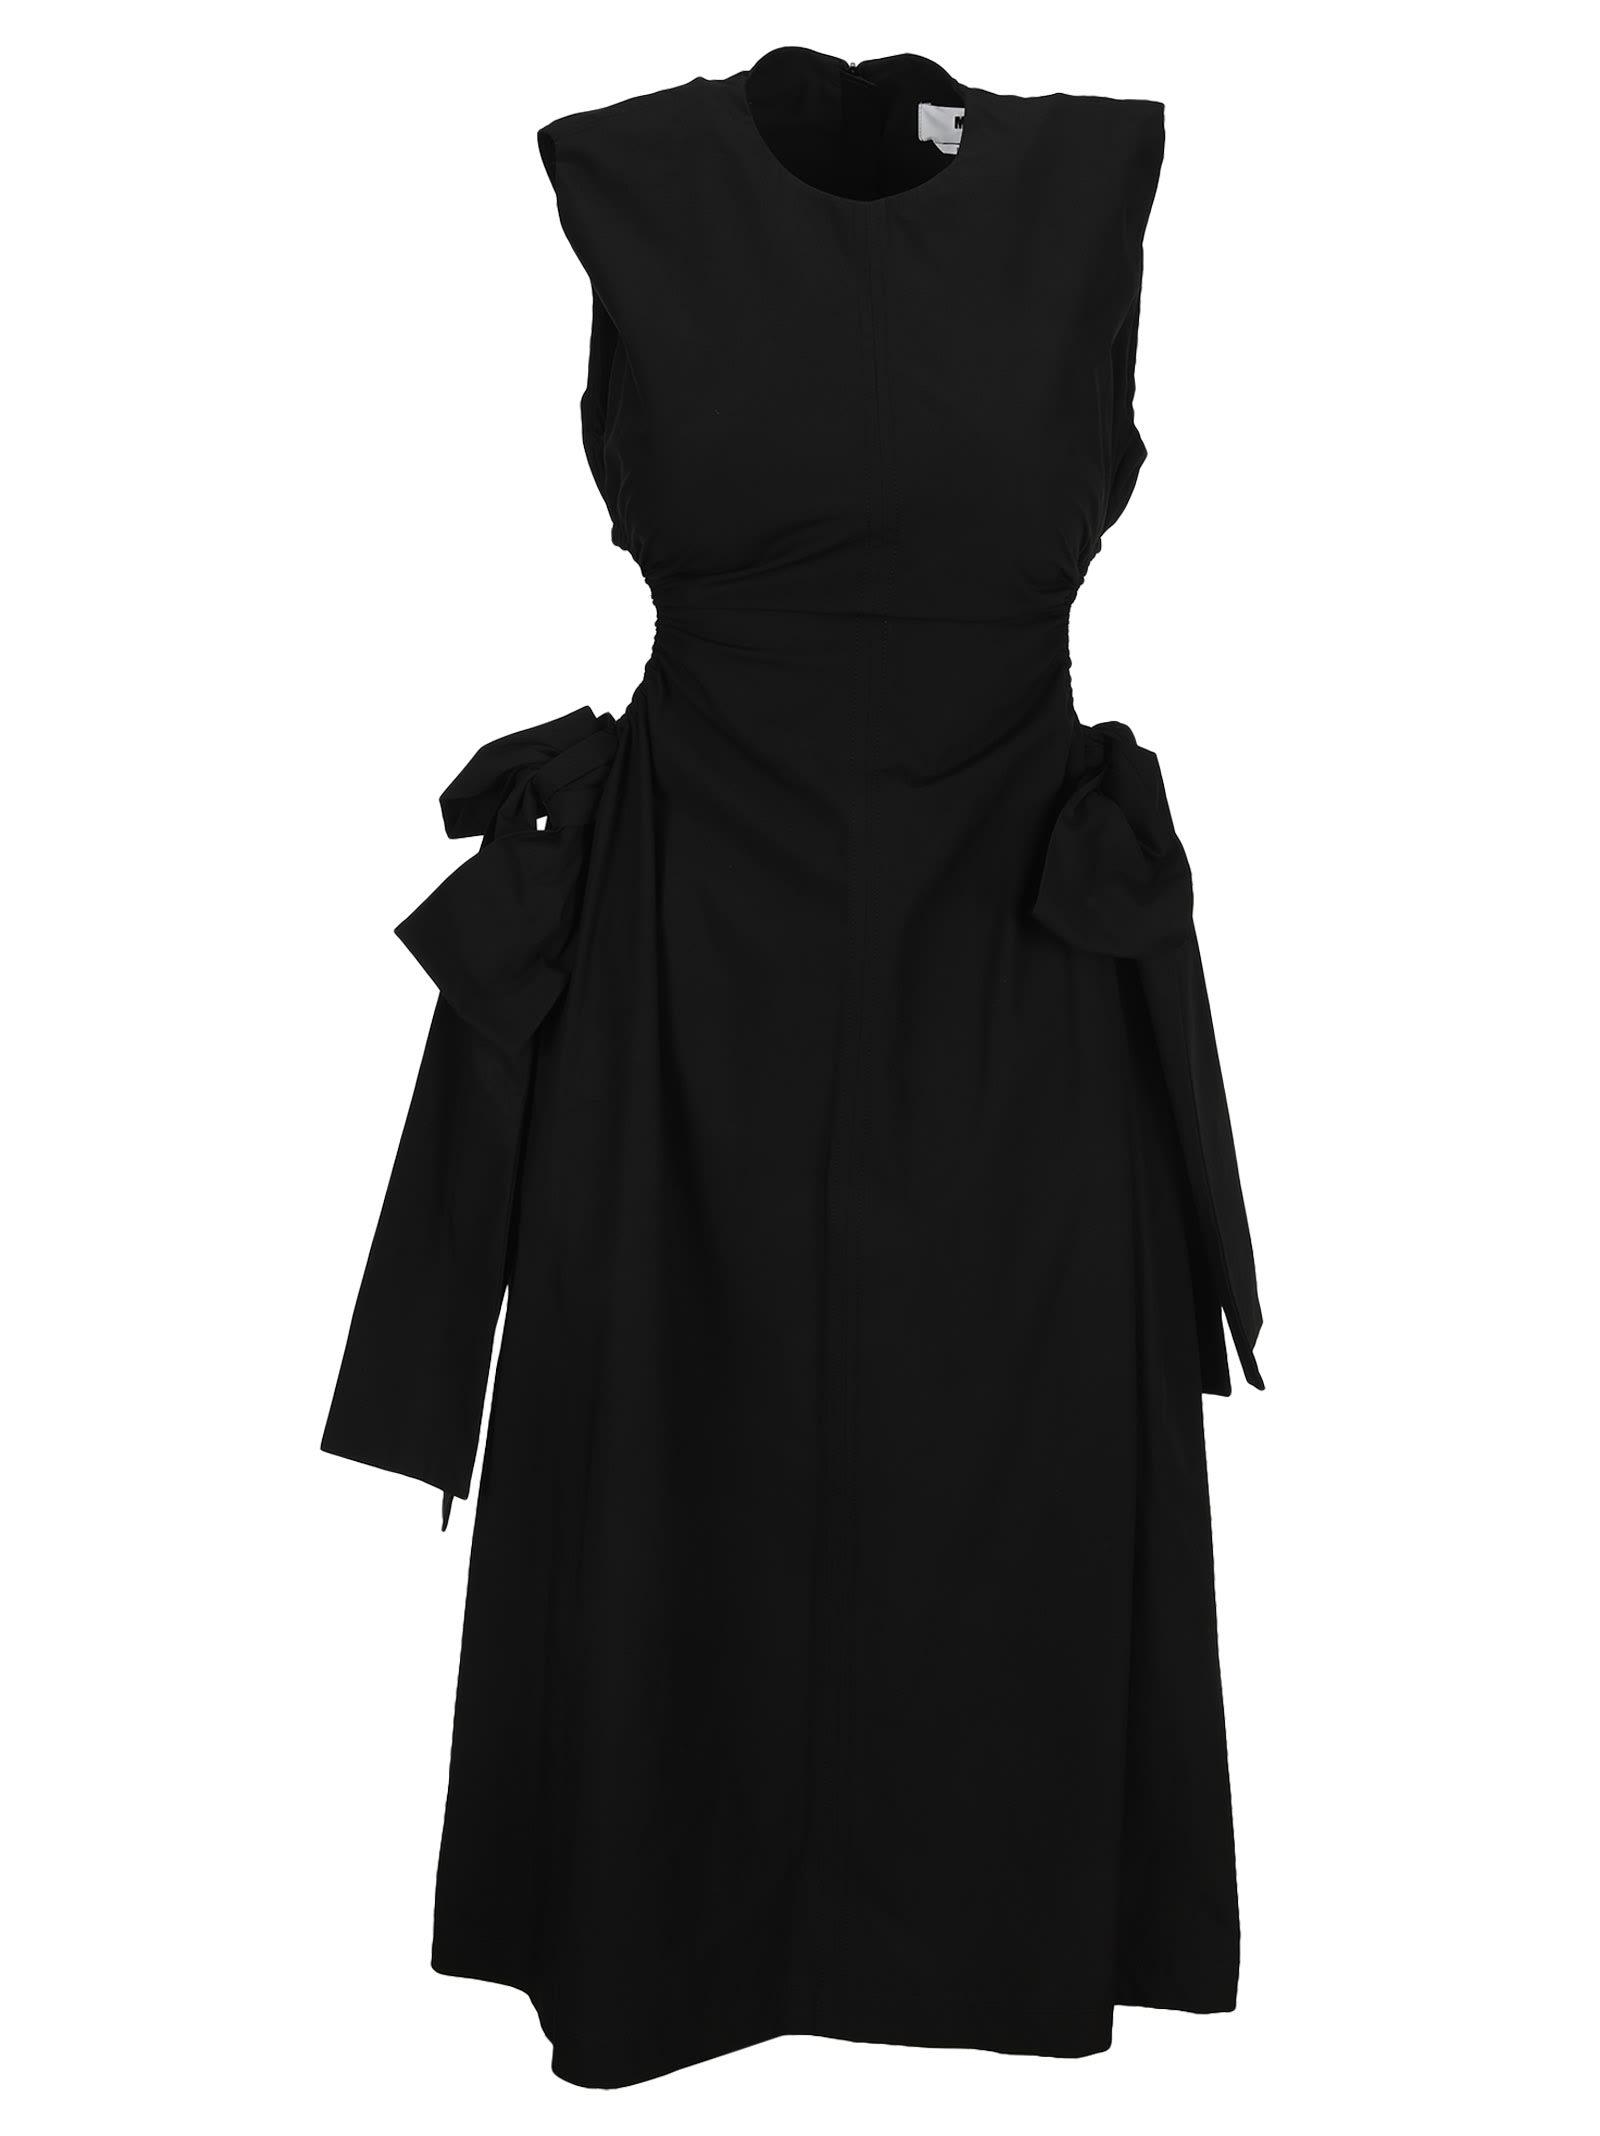 Msgm Clothing MSGM CUT-OUT DETAIL SLEEVELESS DRESS